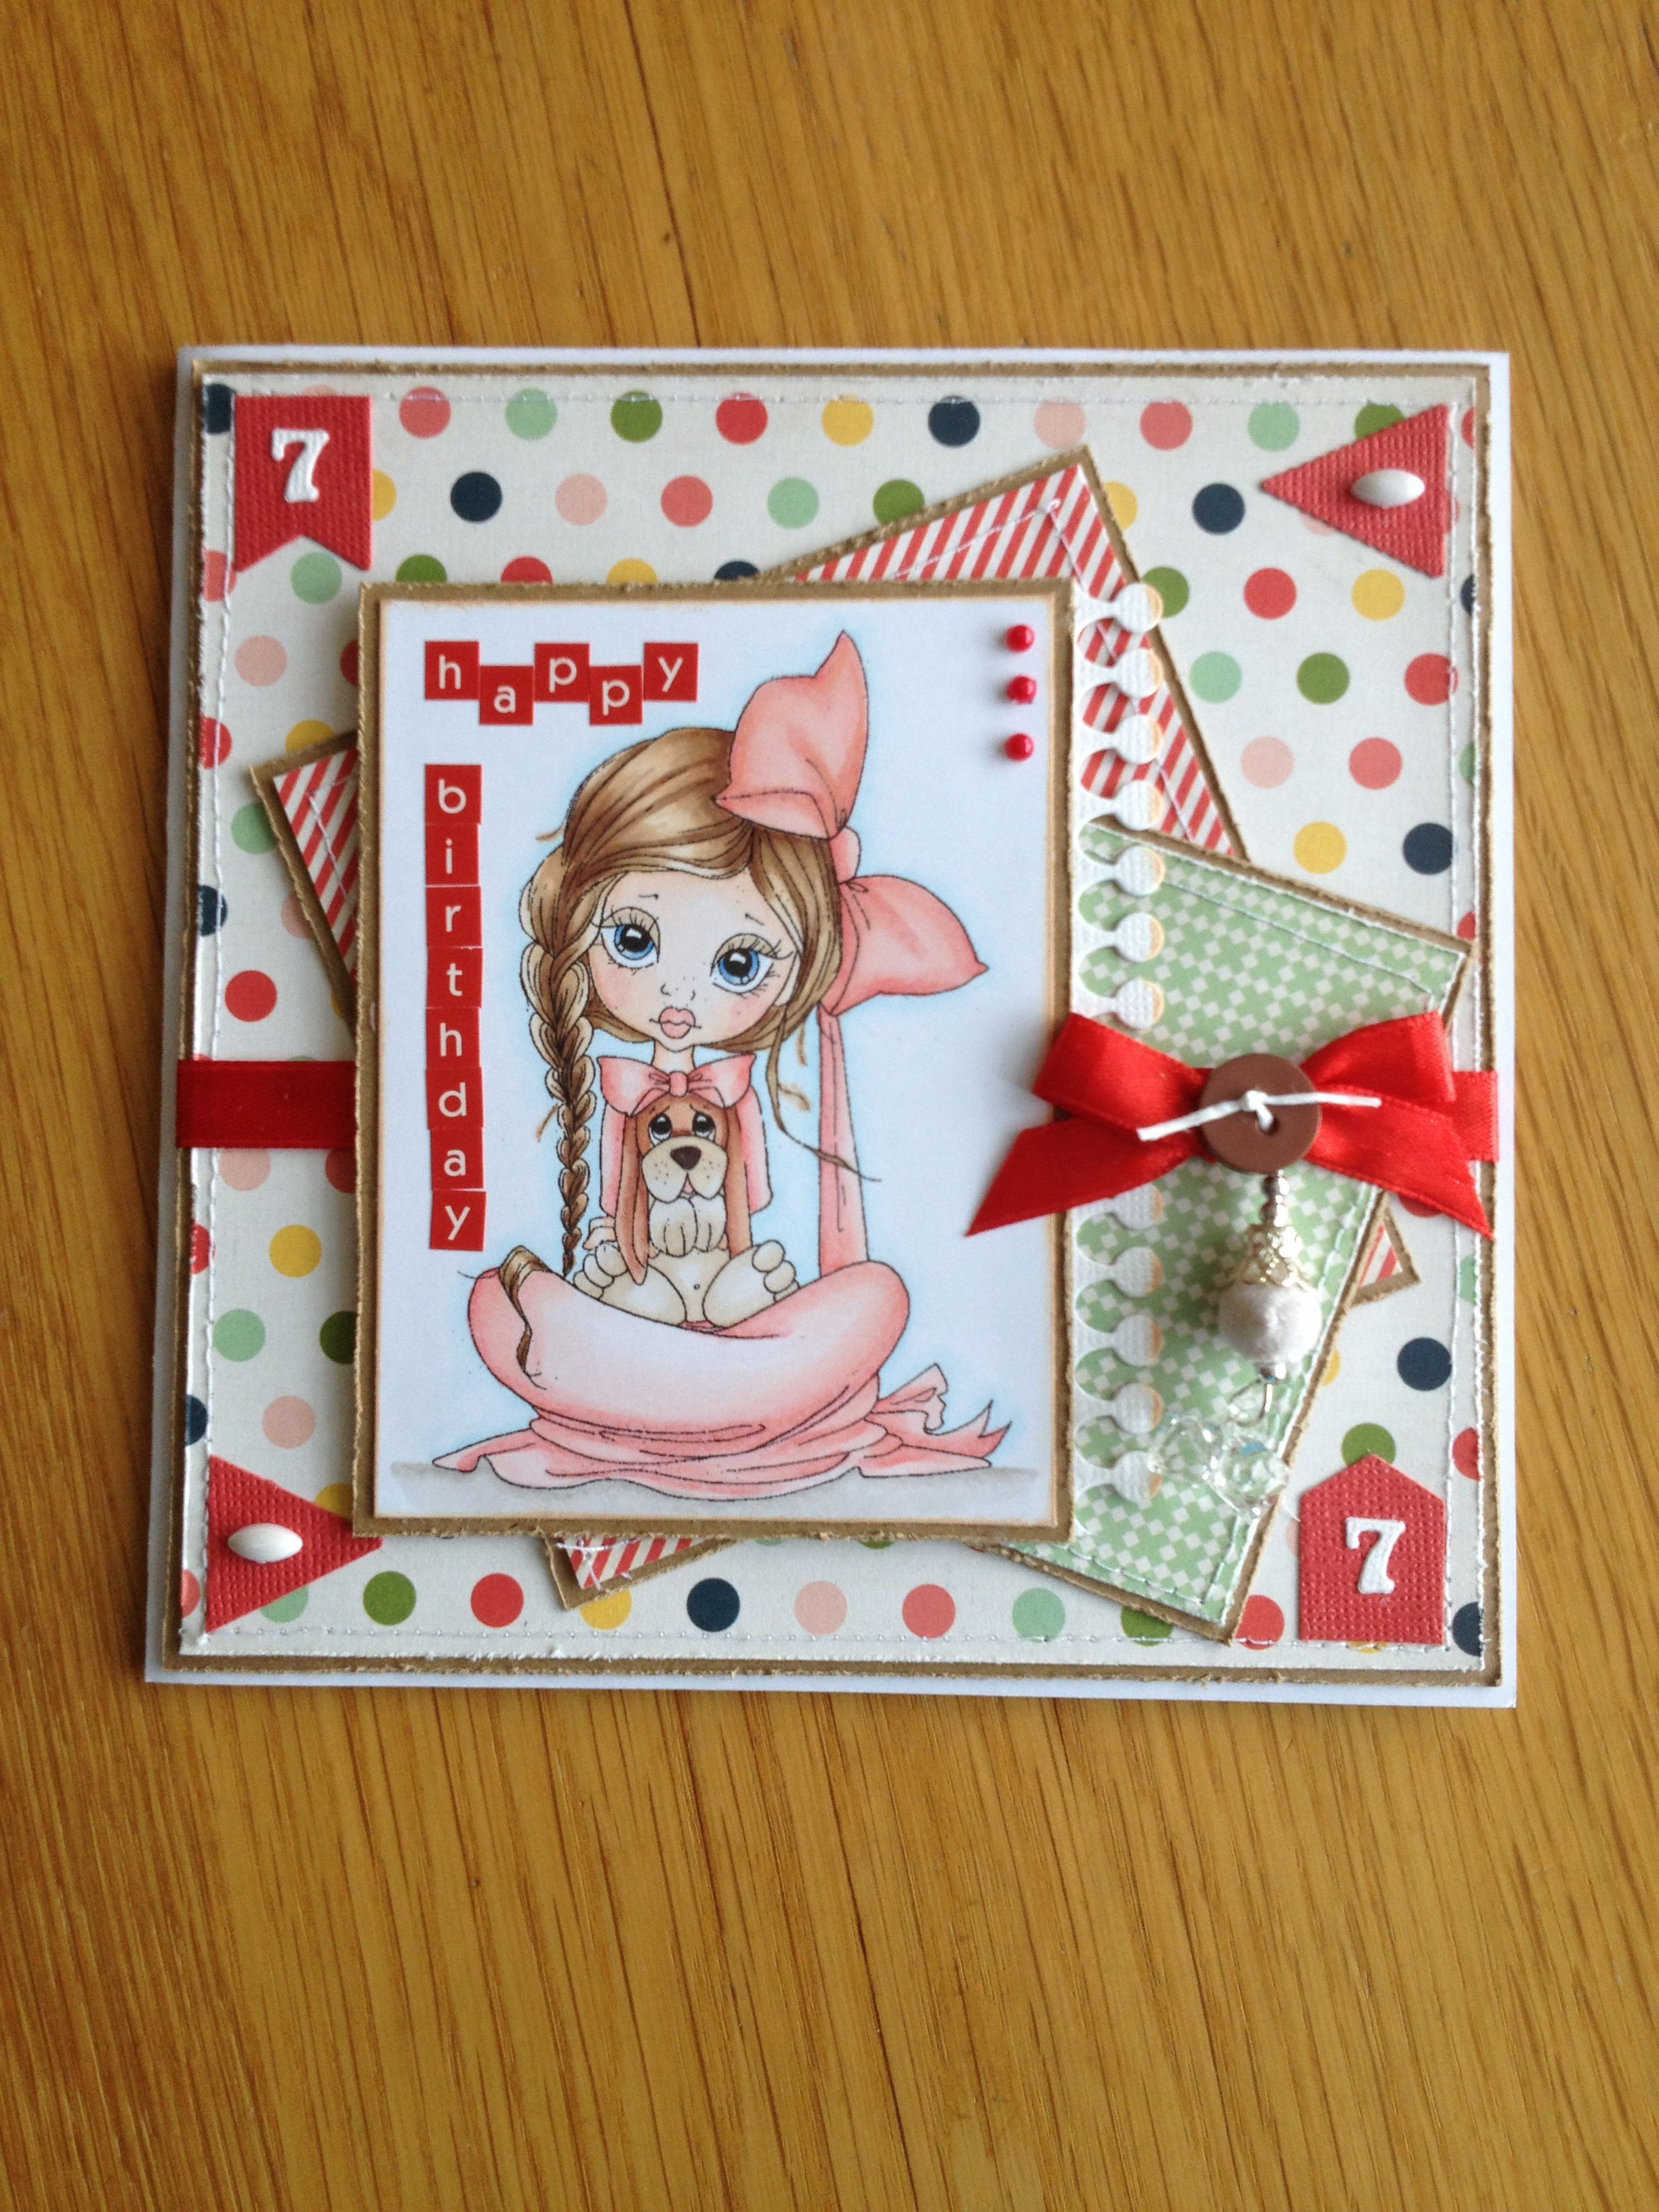 Birthday Card Girl 7 Years Old